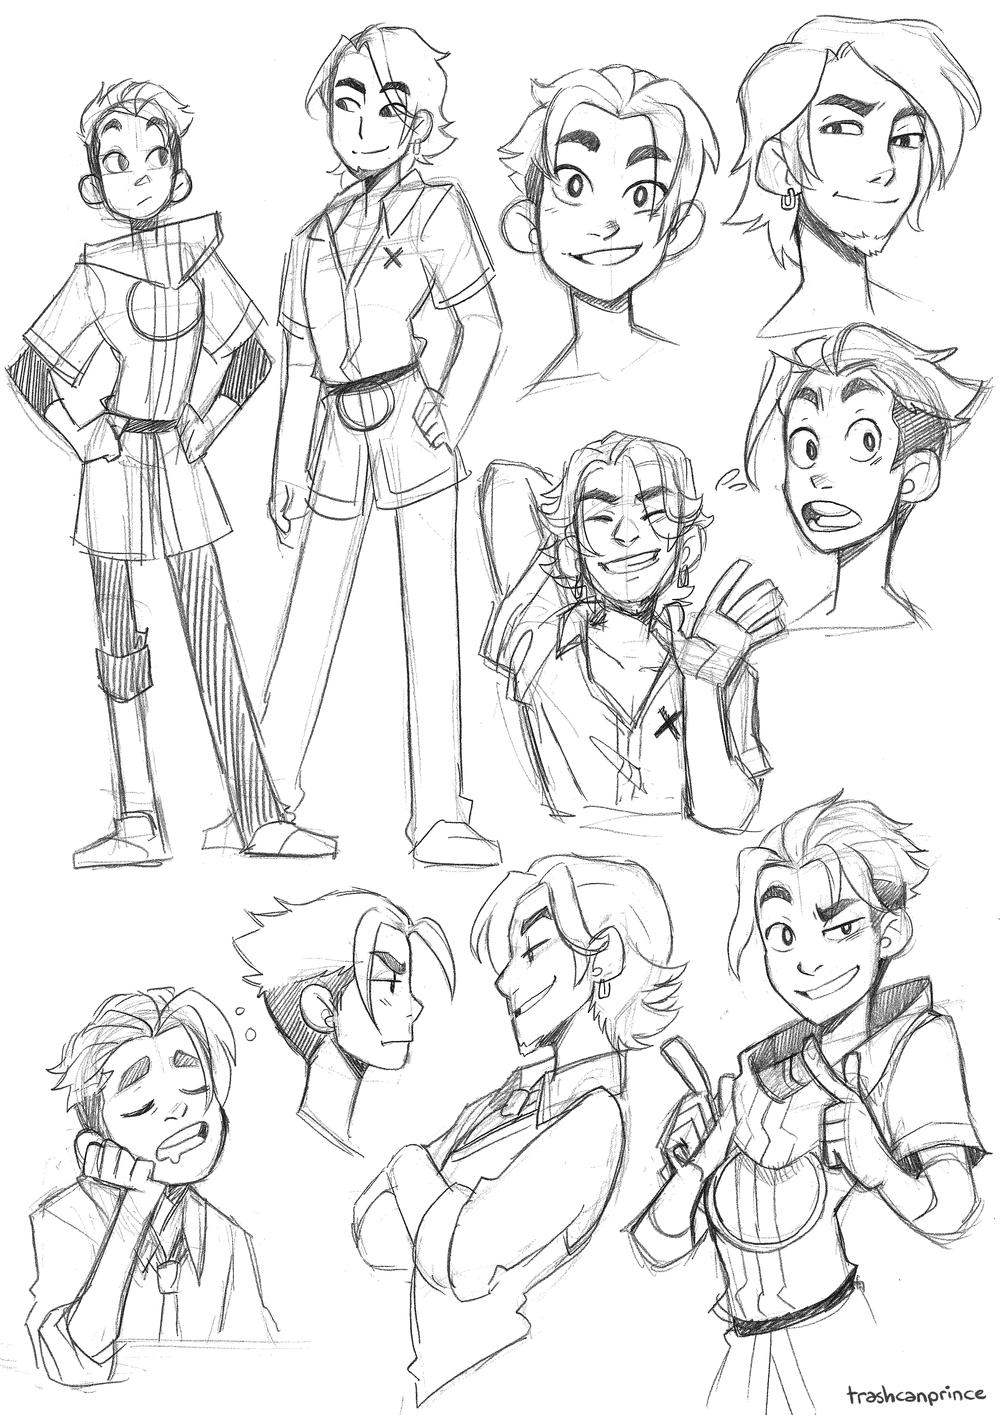 Flux Destiny character studies by Lauren Buttfield.